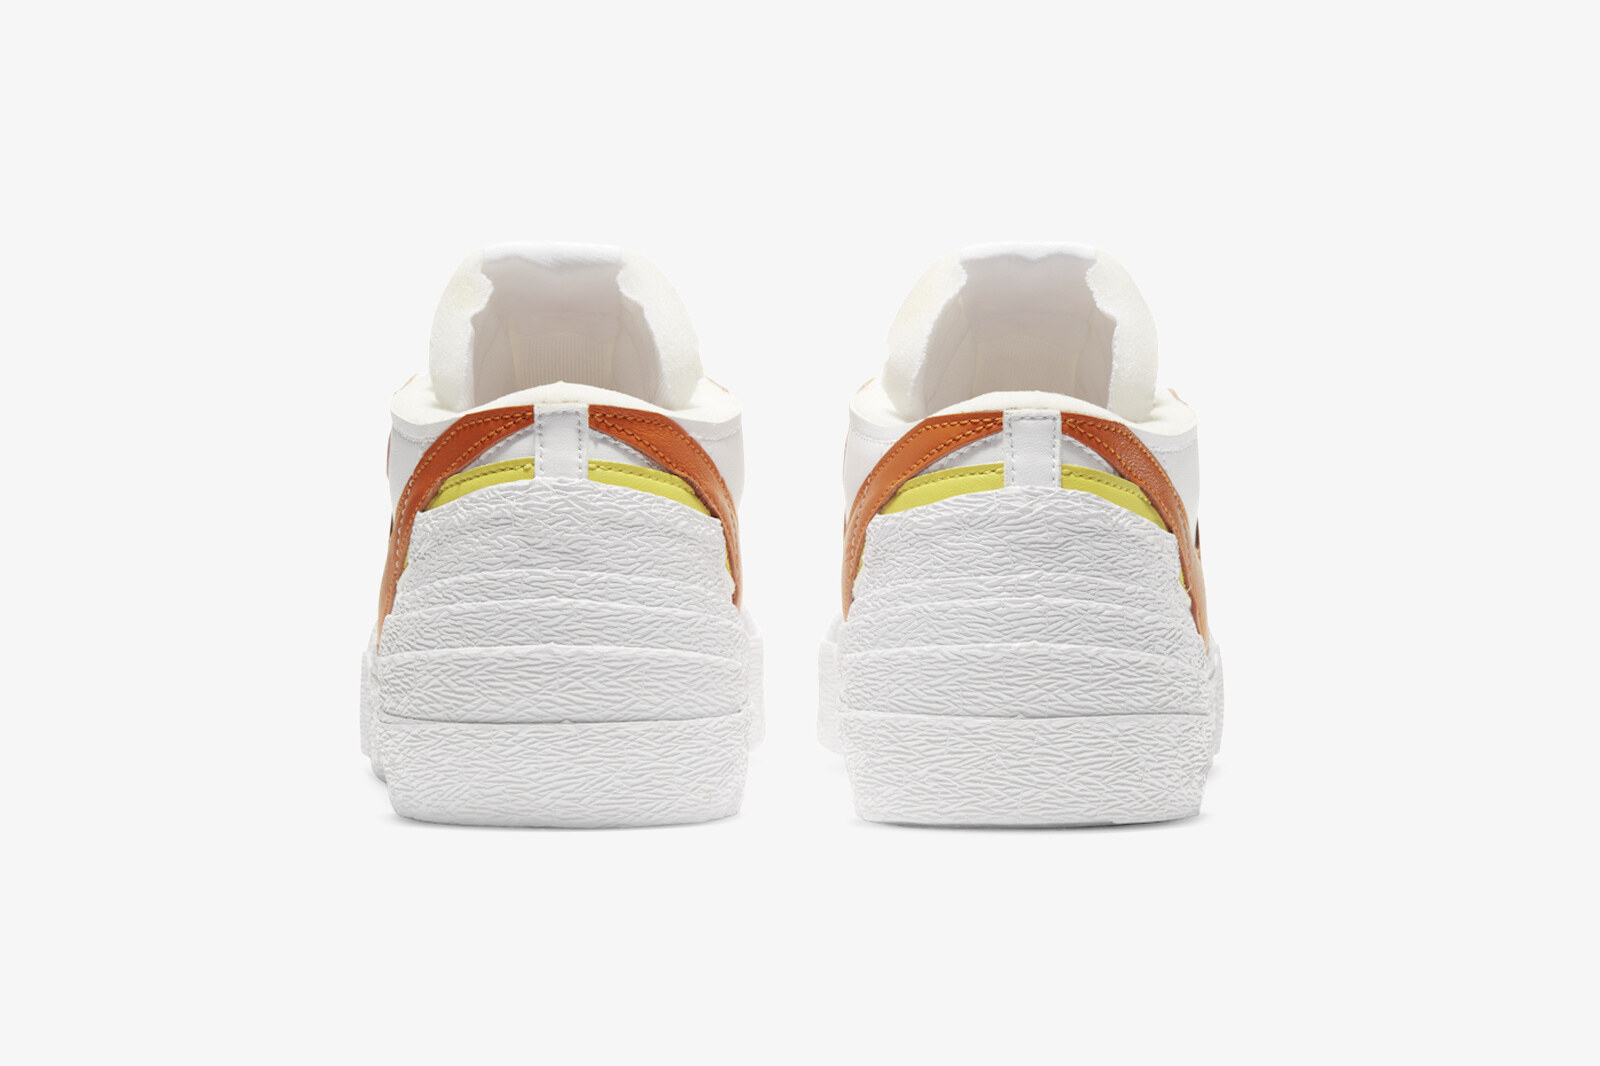 Sacai x Nike Blazer Low Magma Orange